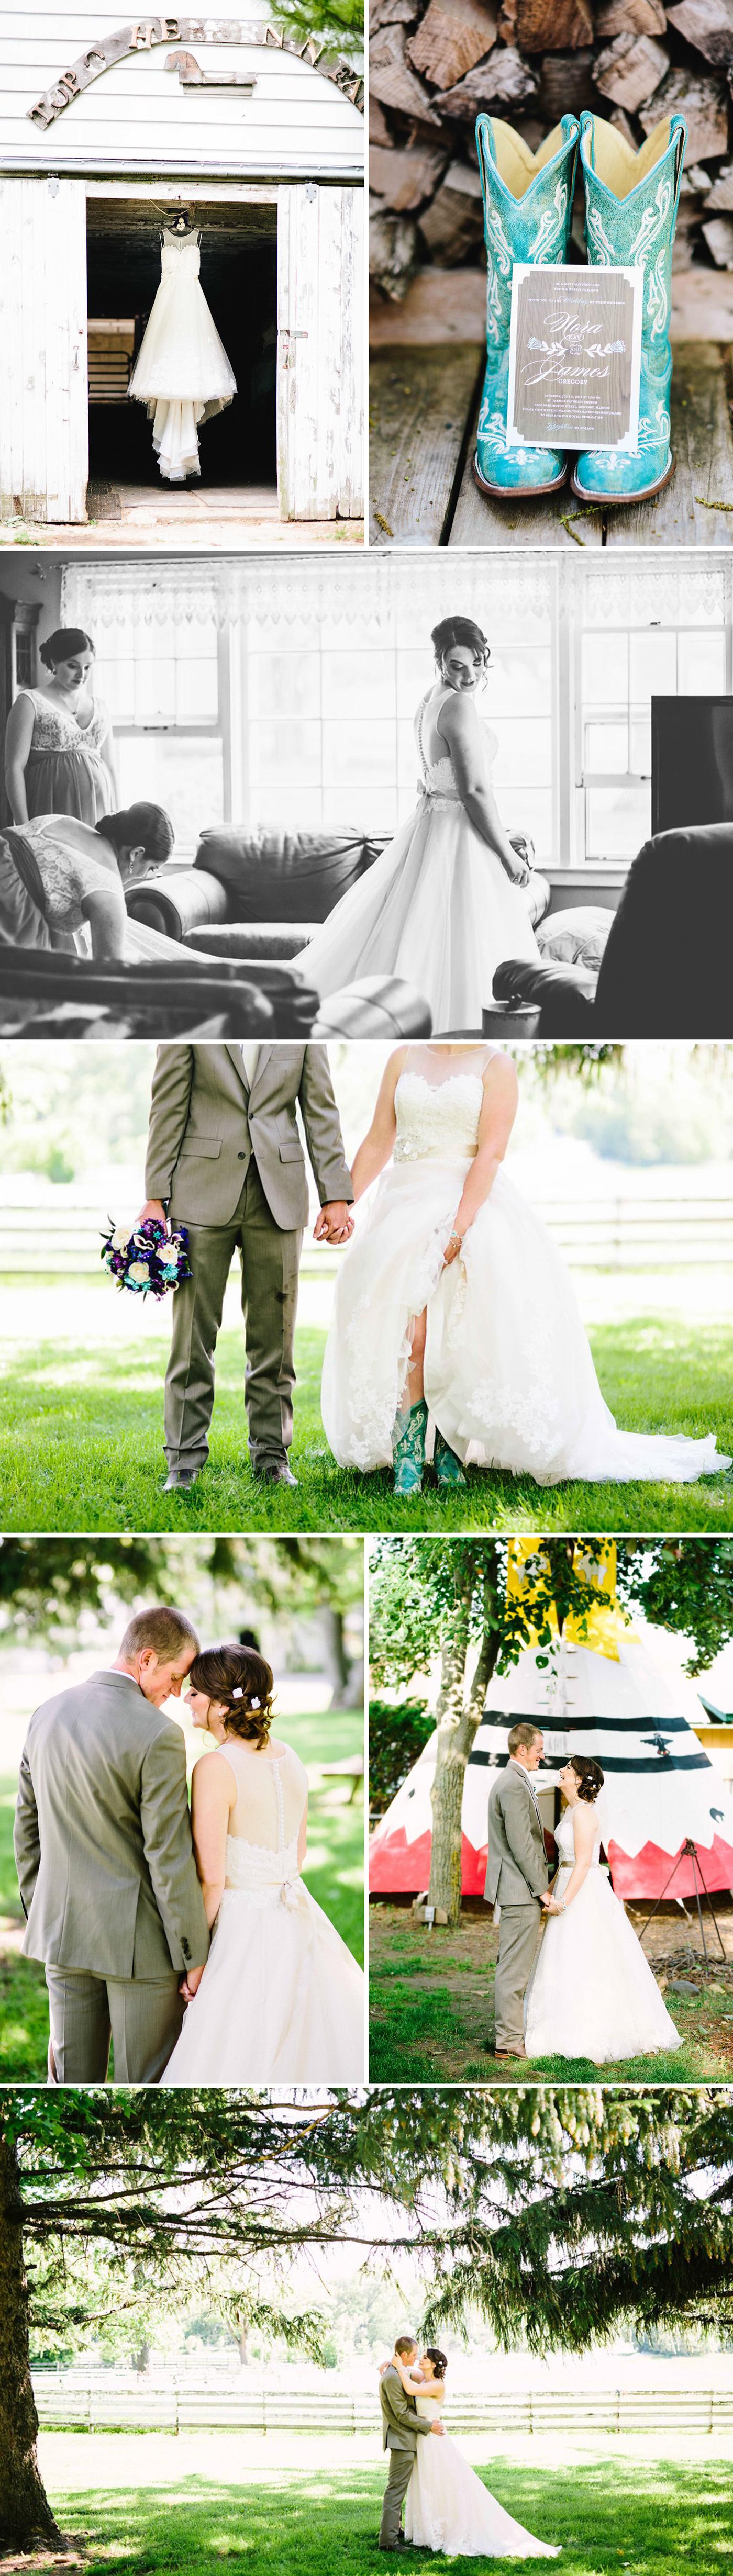 chicago-fine-art-wedding-photography-furlano